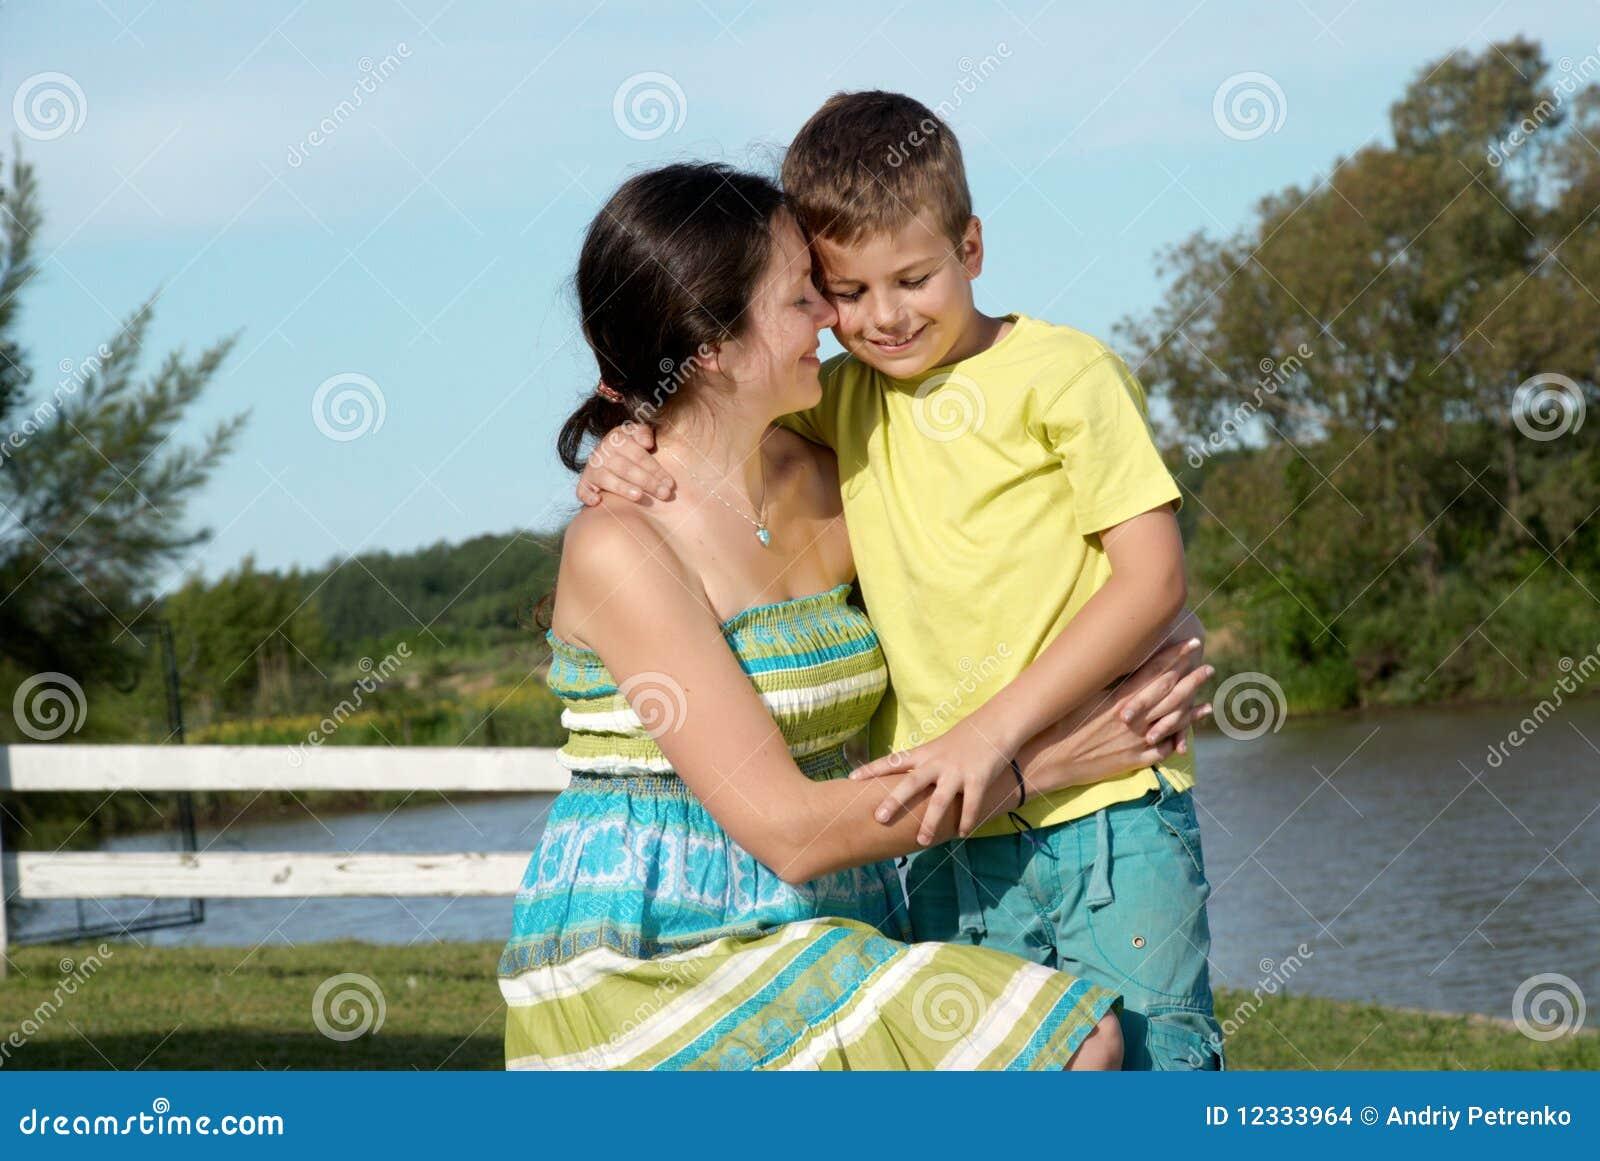 Матушка и сынок фото 304-746